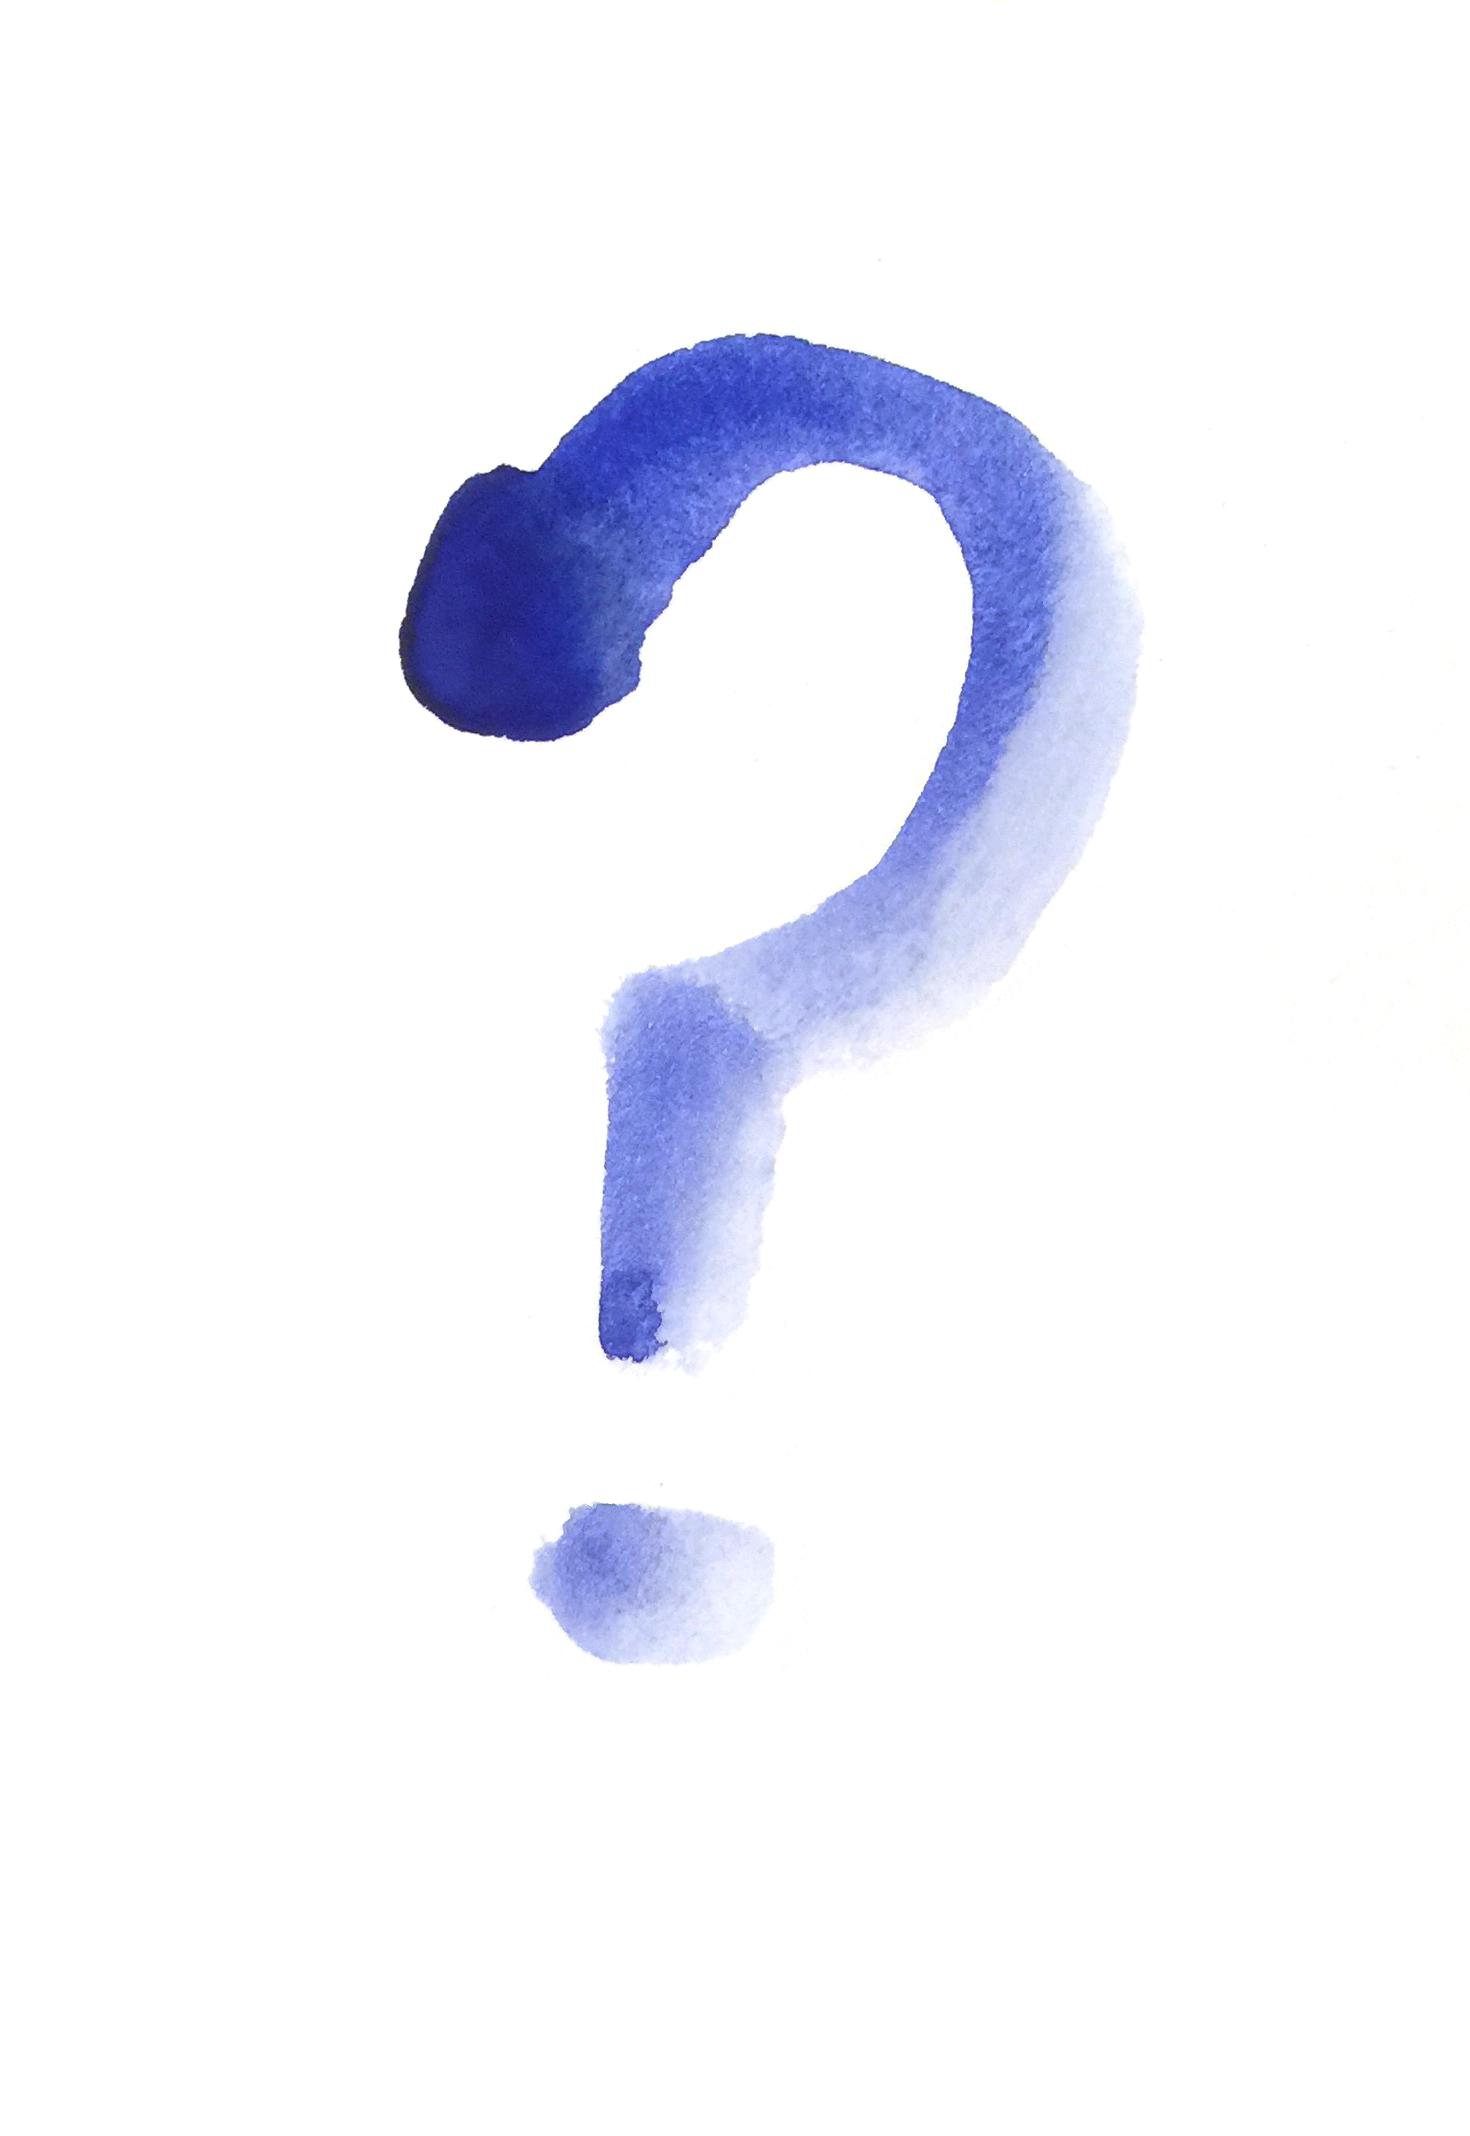 EPBP_Version2-QuestionMark.jpg